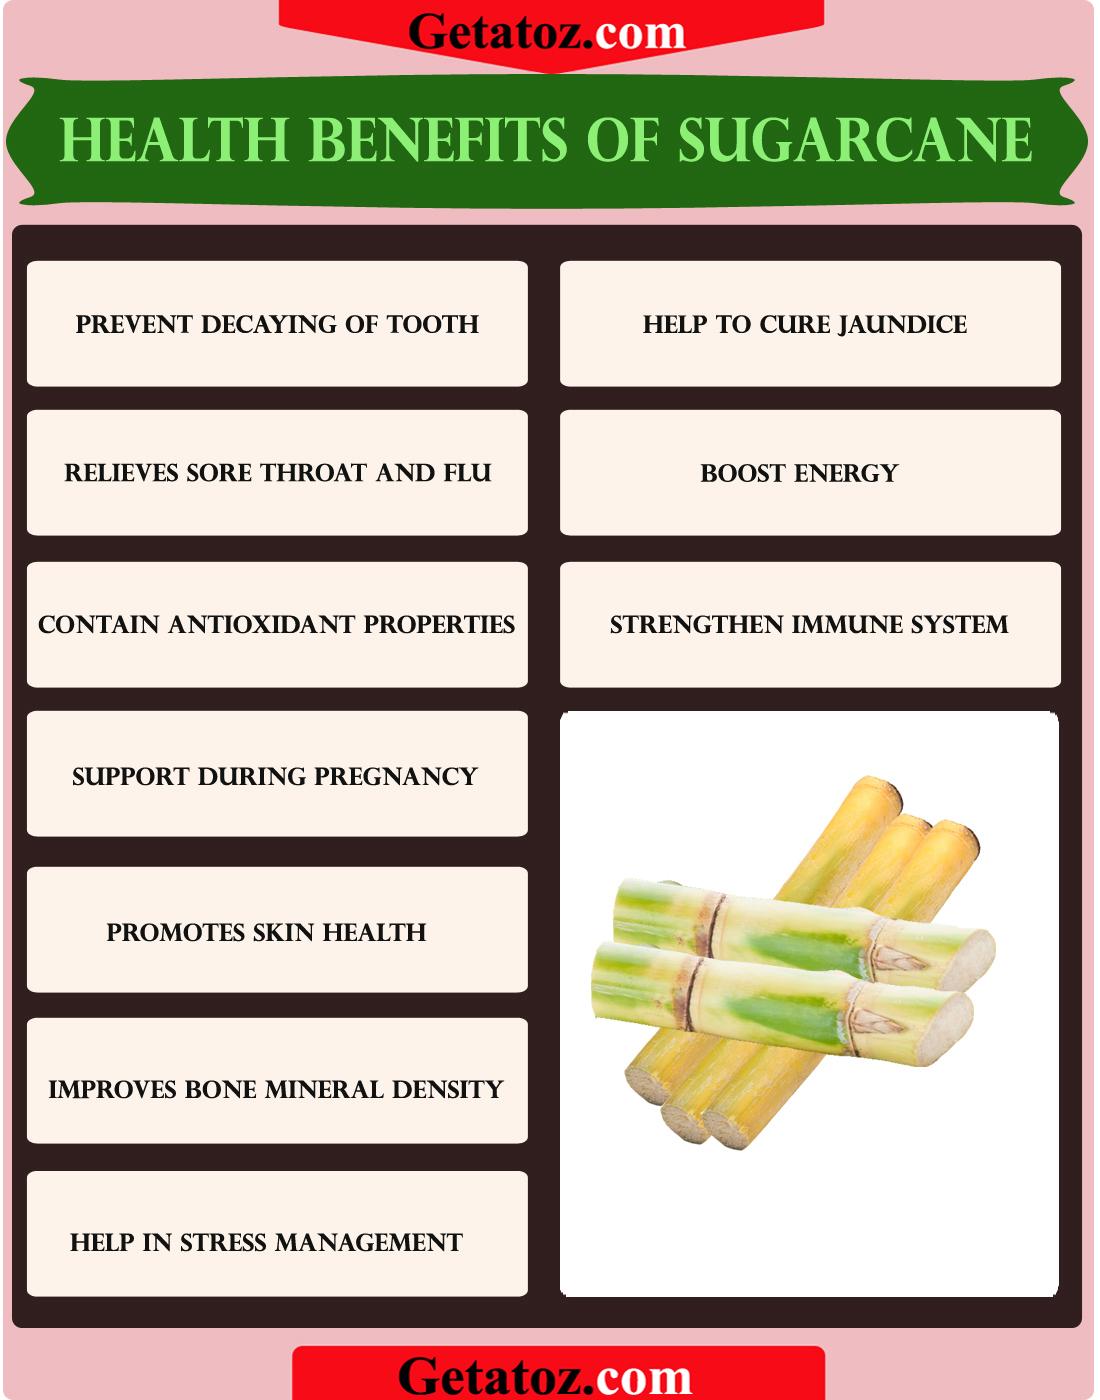 10 health benefits of sugarcane : getatoz